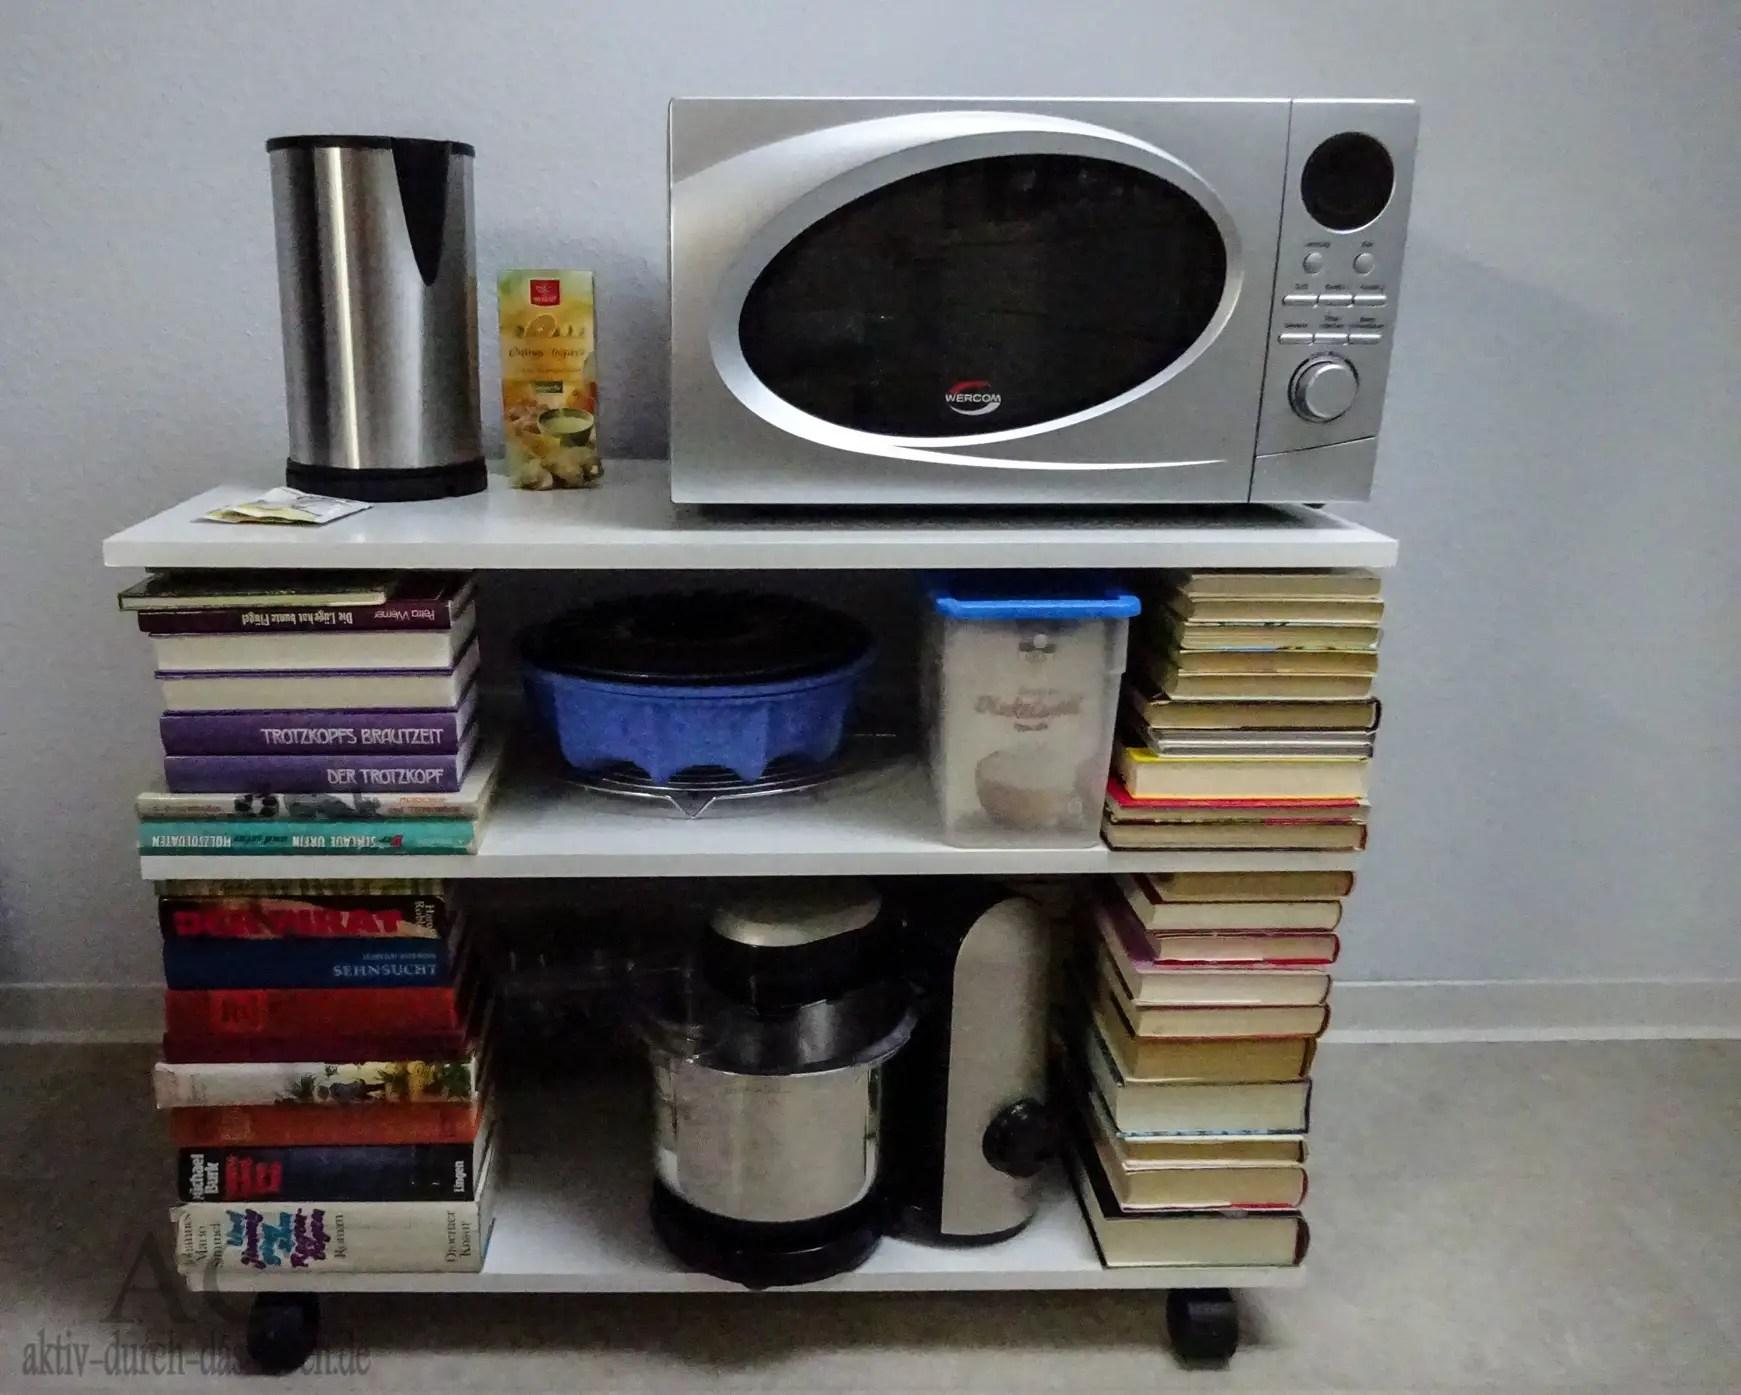 diy regal aus b chern 8 aktiv durch das. Black Bedroom Furniture Sets. Home Design Ideas